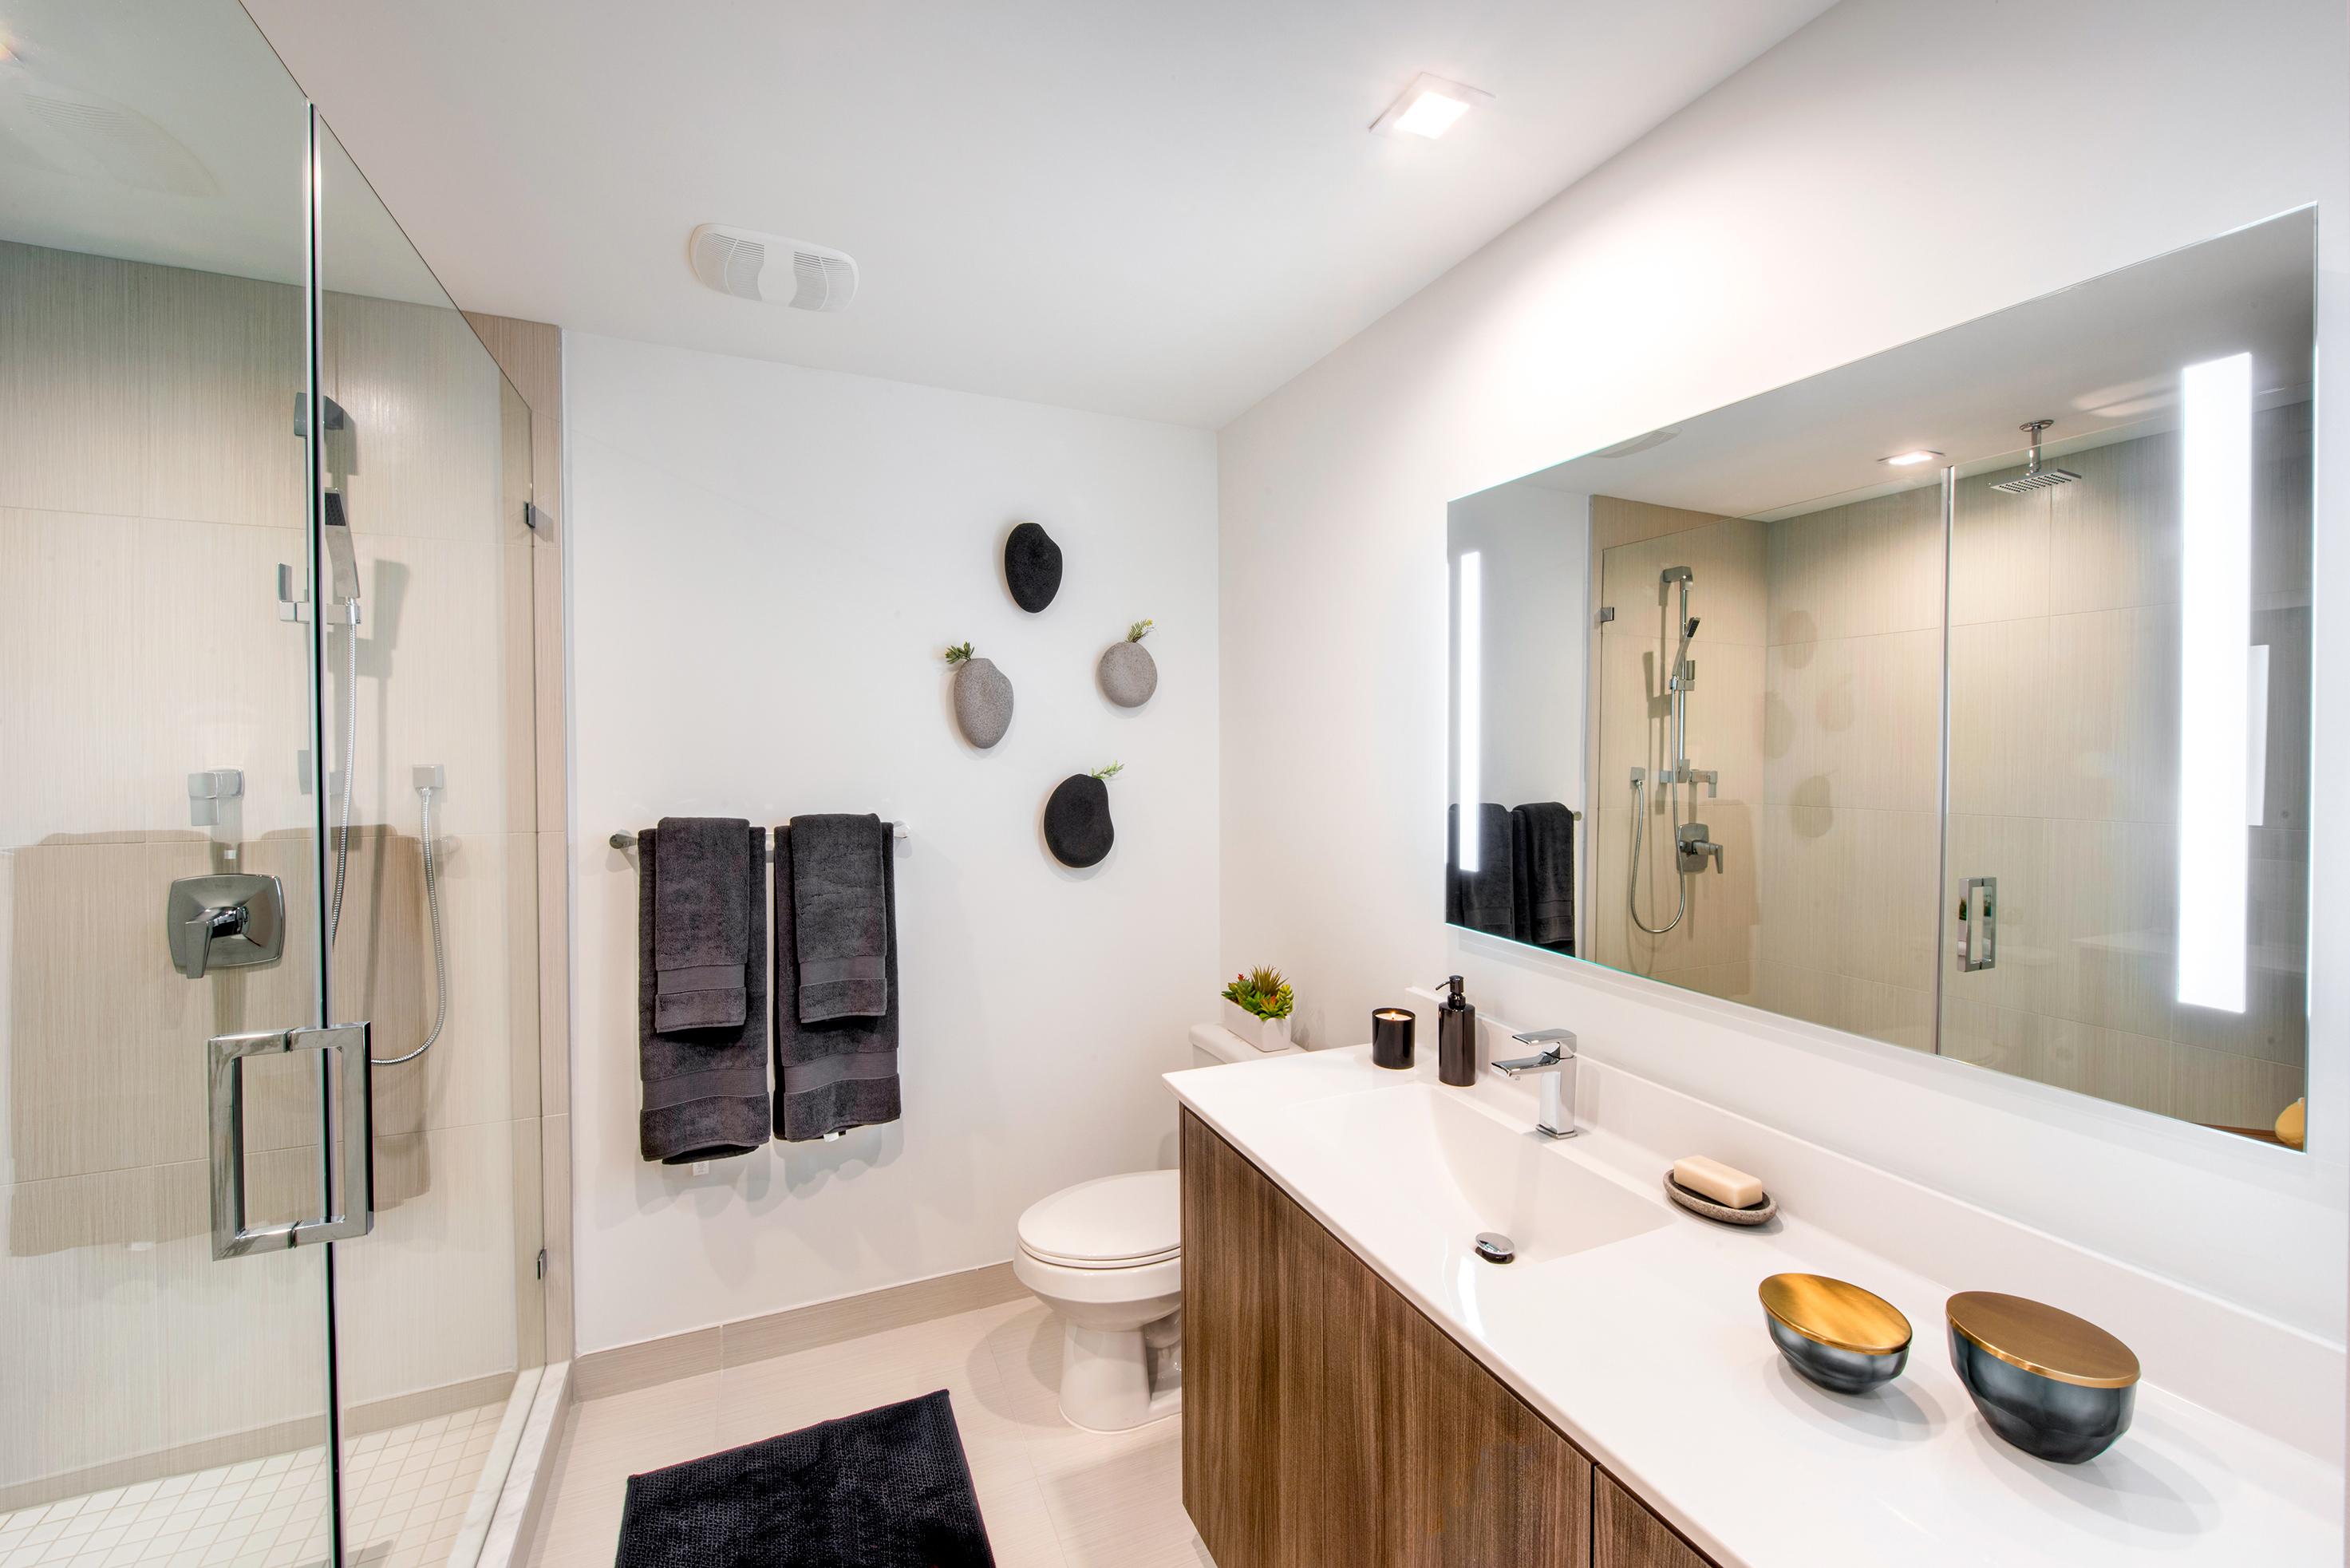 Shower Bathroom at Sanctuary Doral